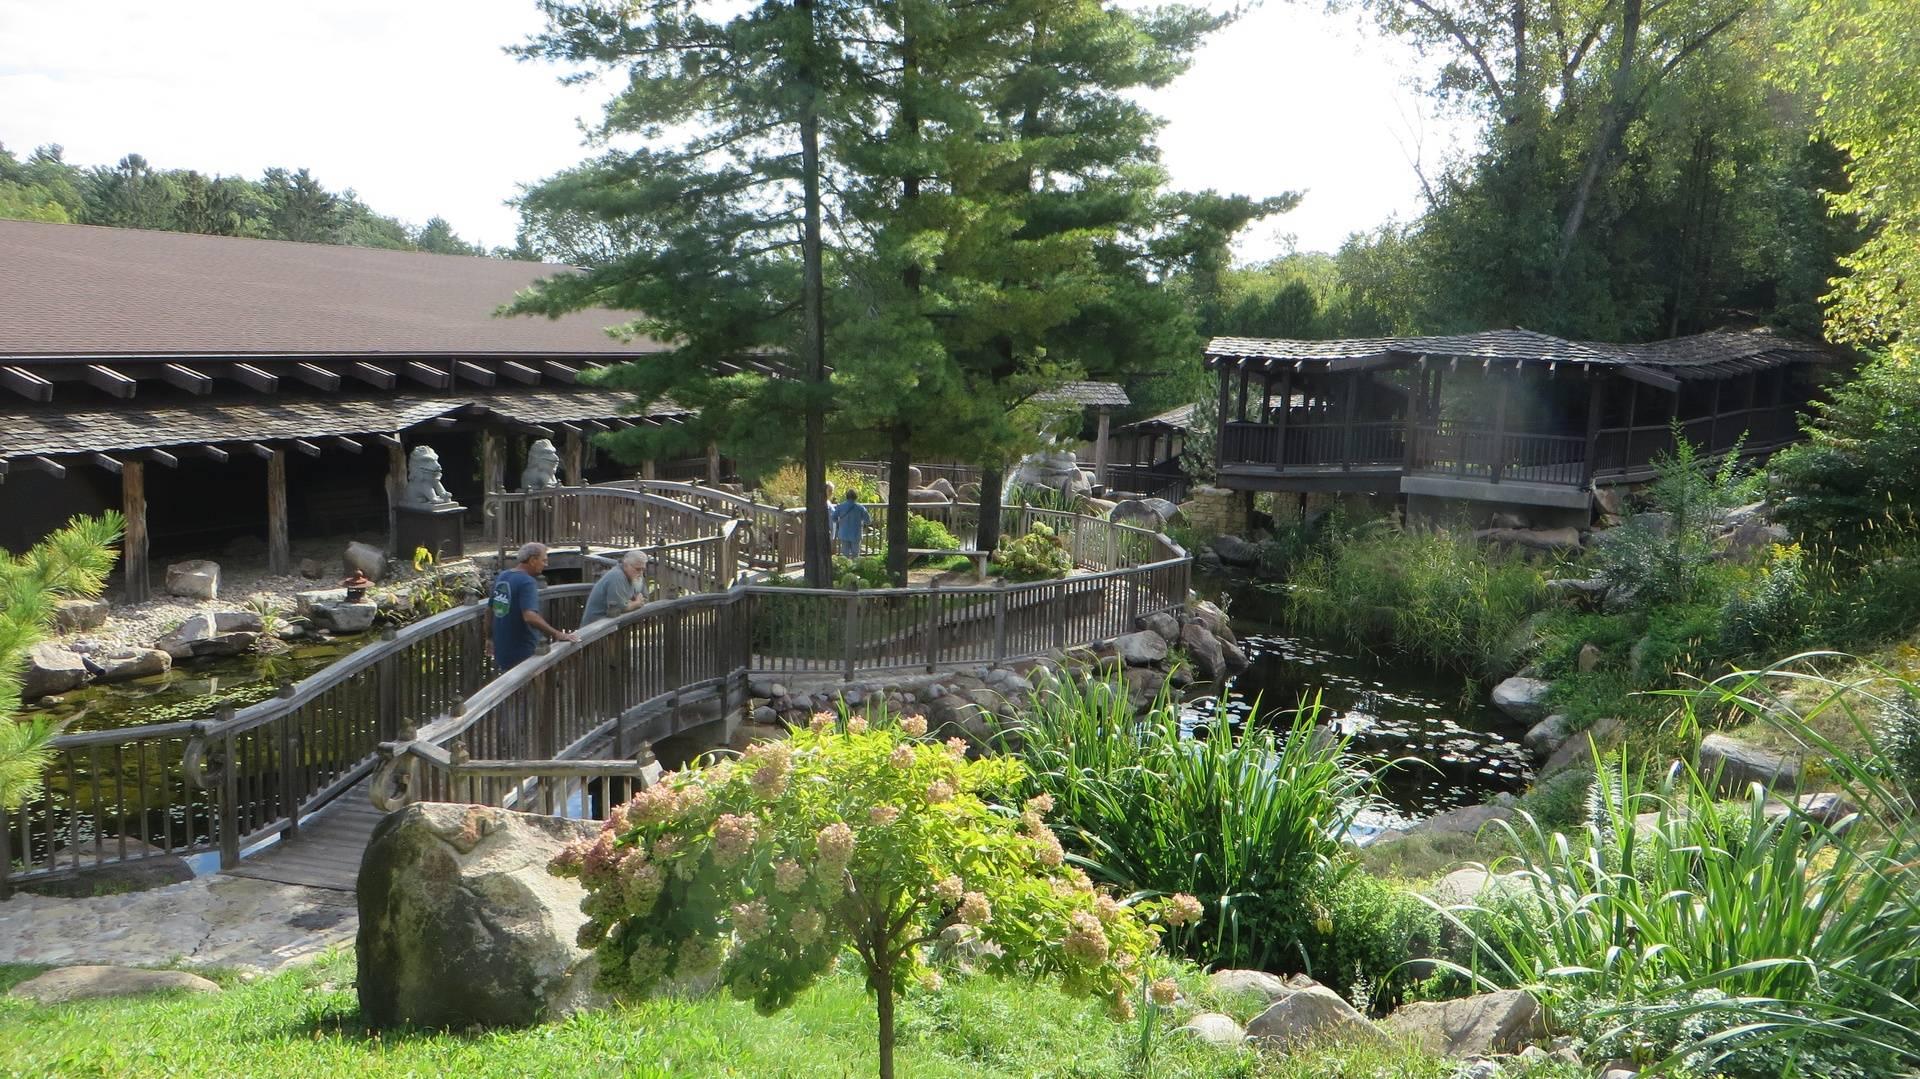 House on the Rock - garden